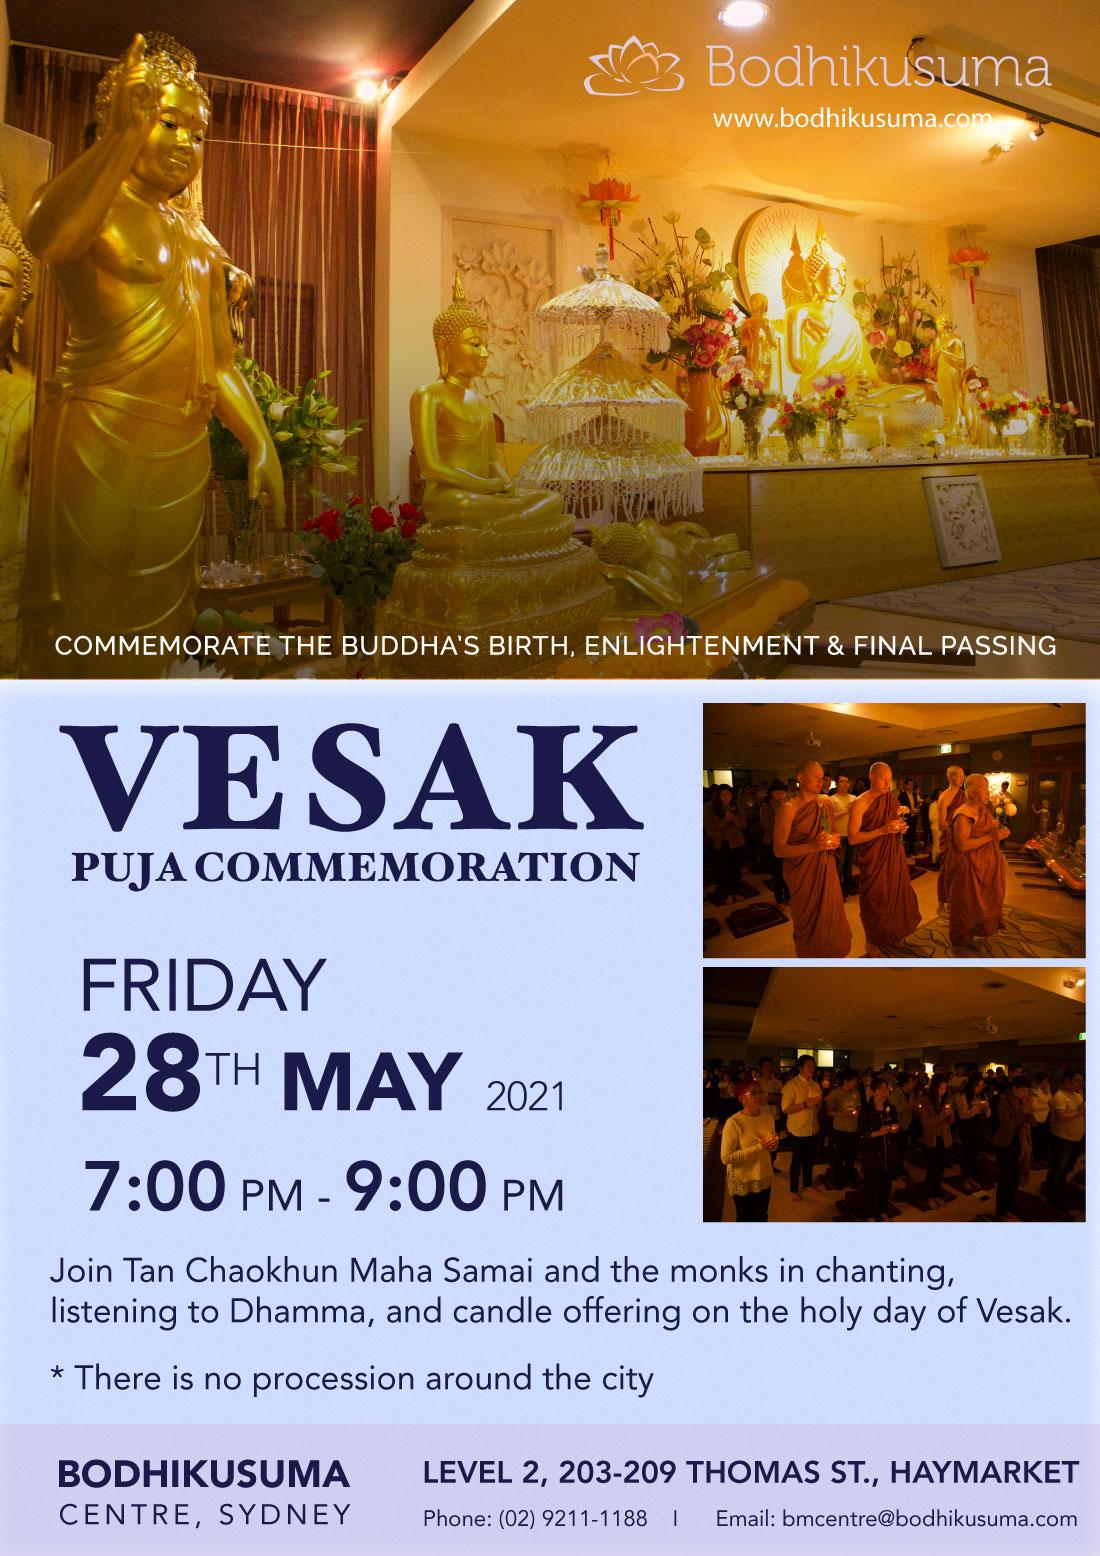 Vesak Puja Commemoration